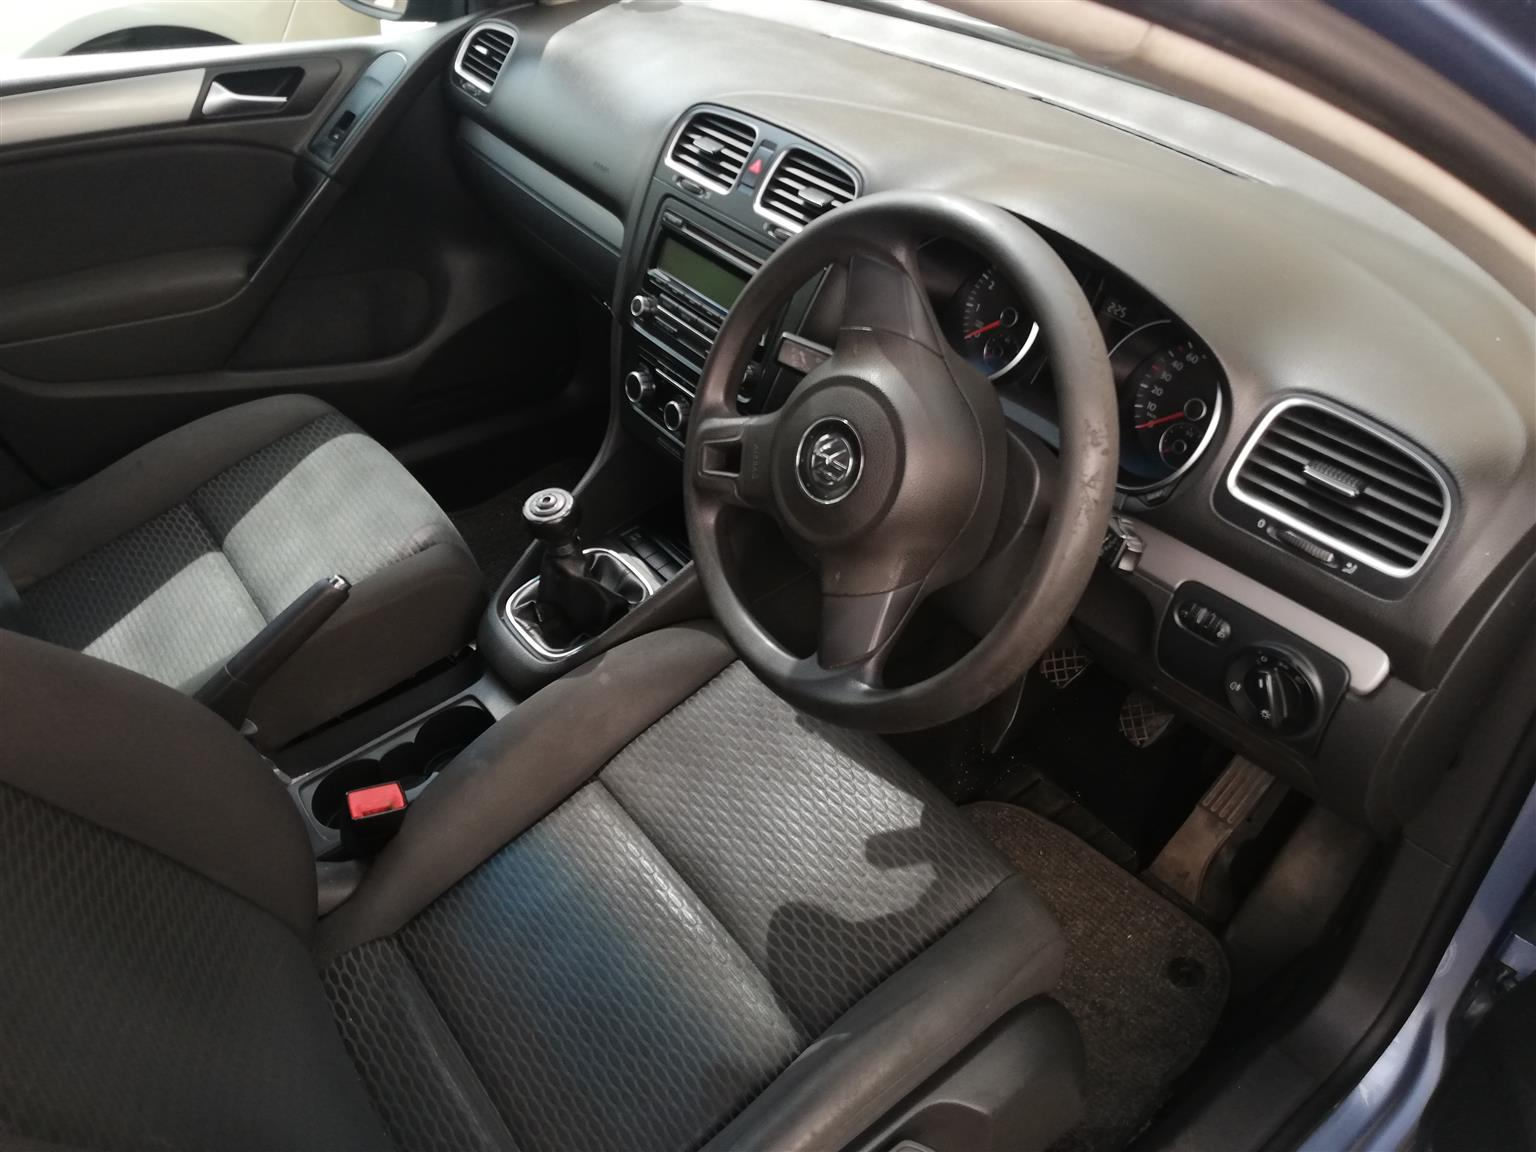 2009 VW Golf 1.6 Comfortline